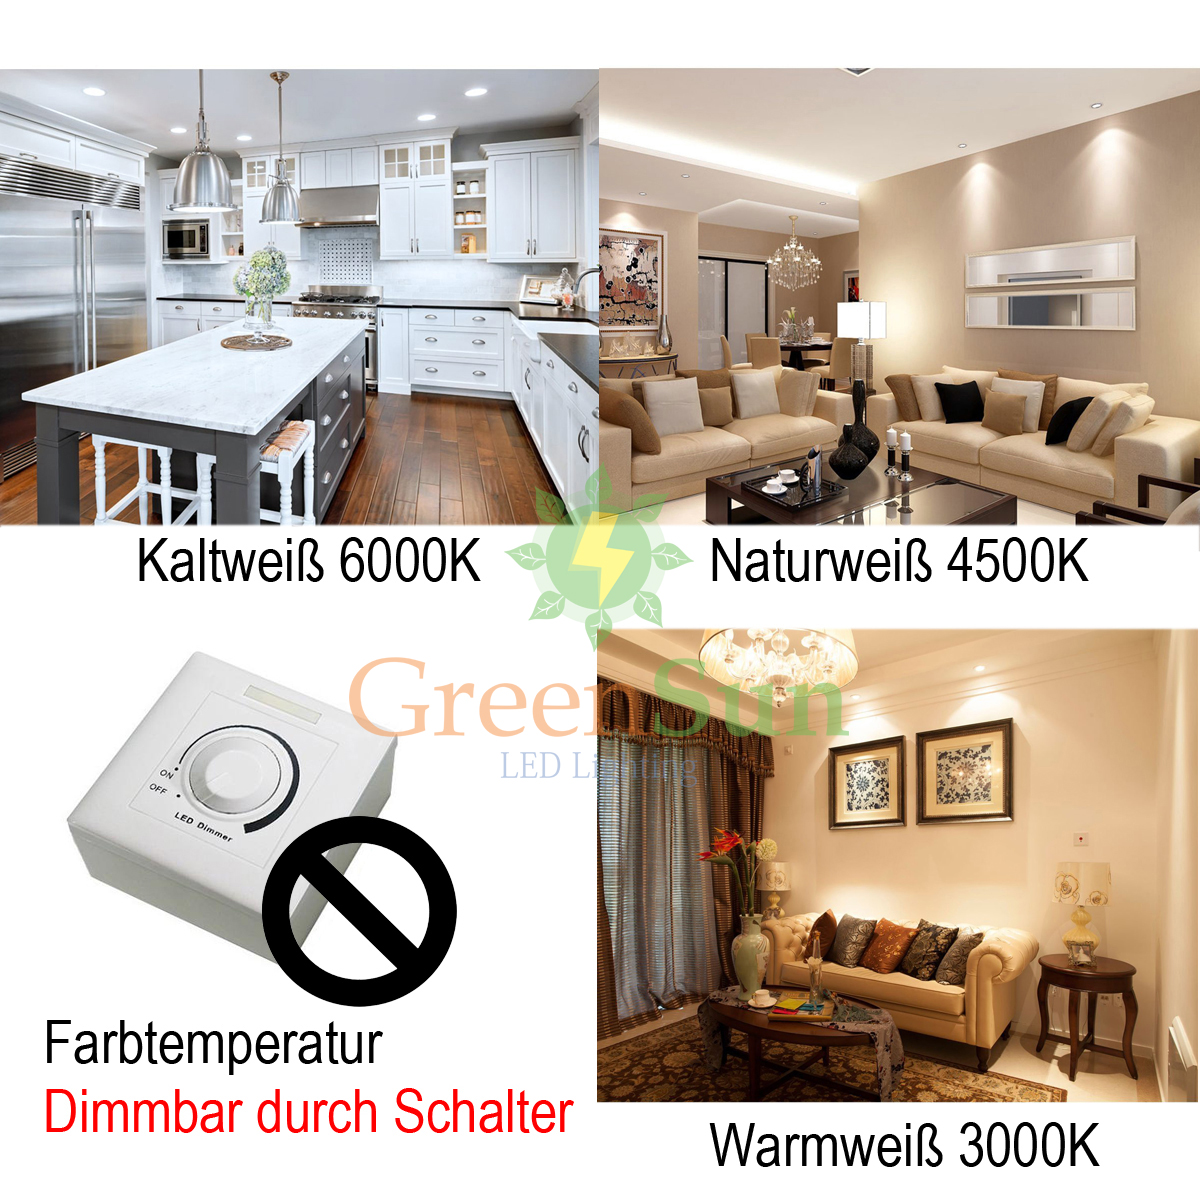 dimmbar 3w g9 led lampe stiftsockel in 3 farbtemperatur gl hbirne leuchtmittel ebay. Black Bedroom Furniture Sets. Home Design Ideas